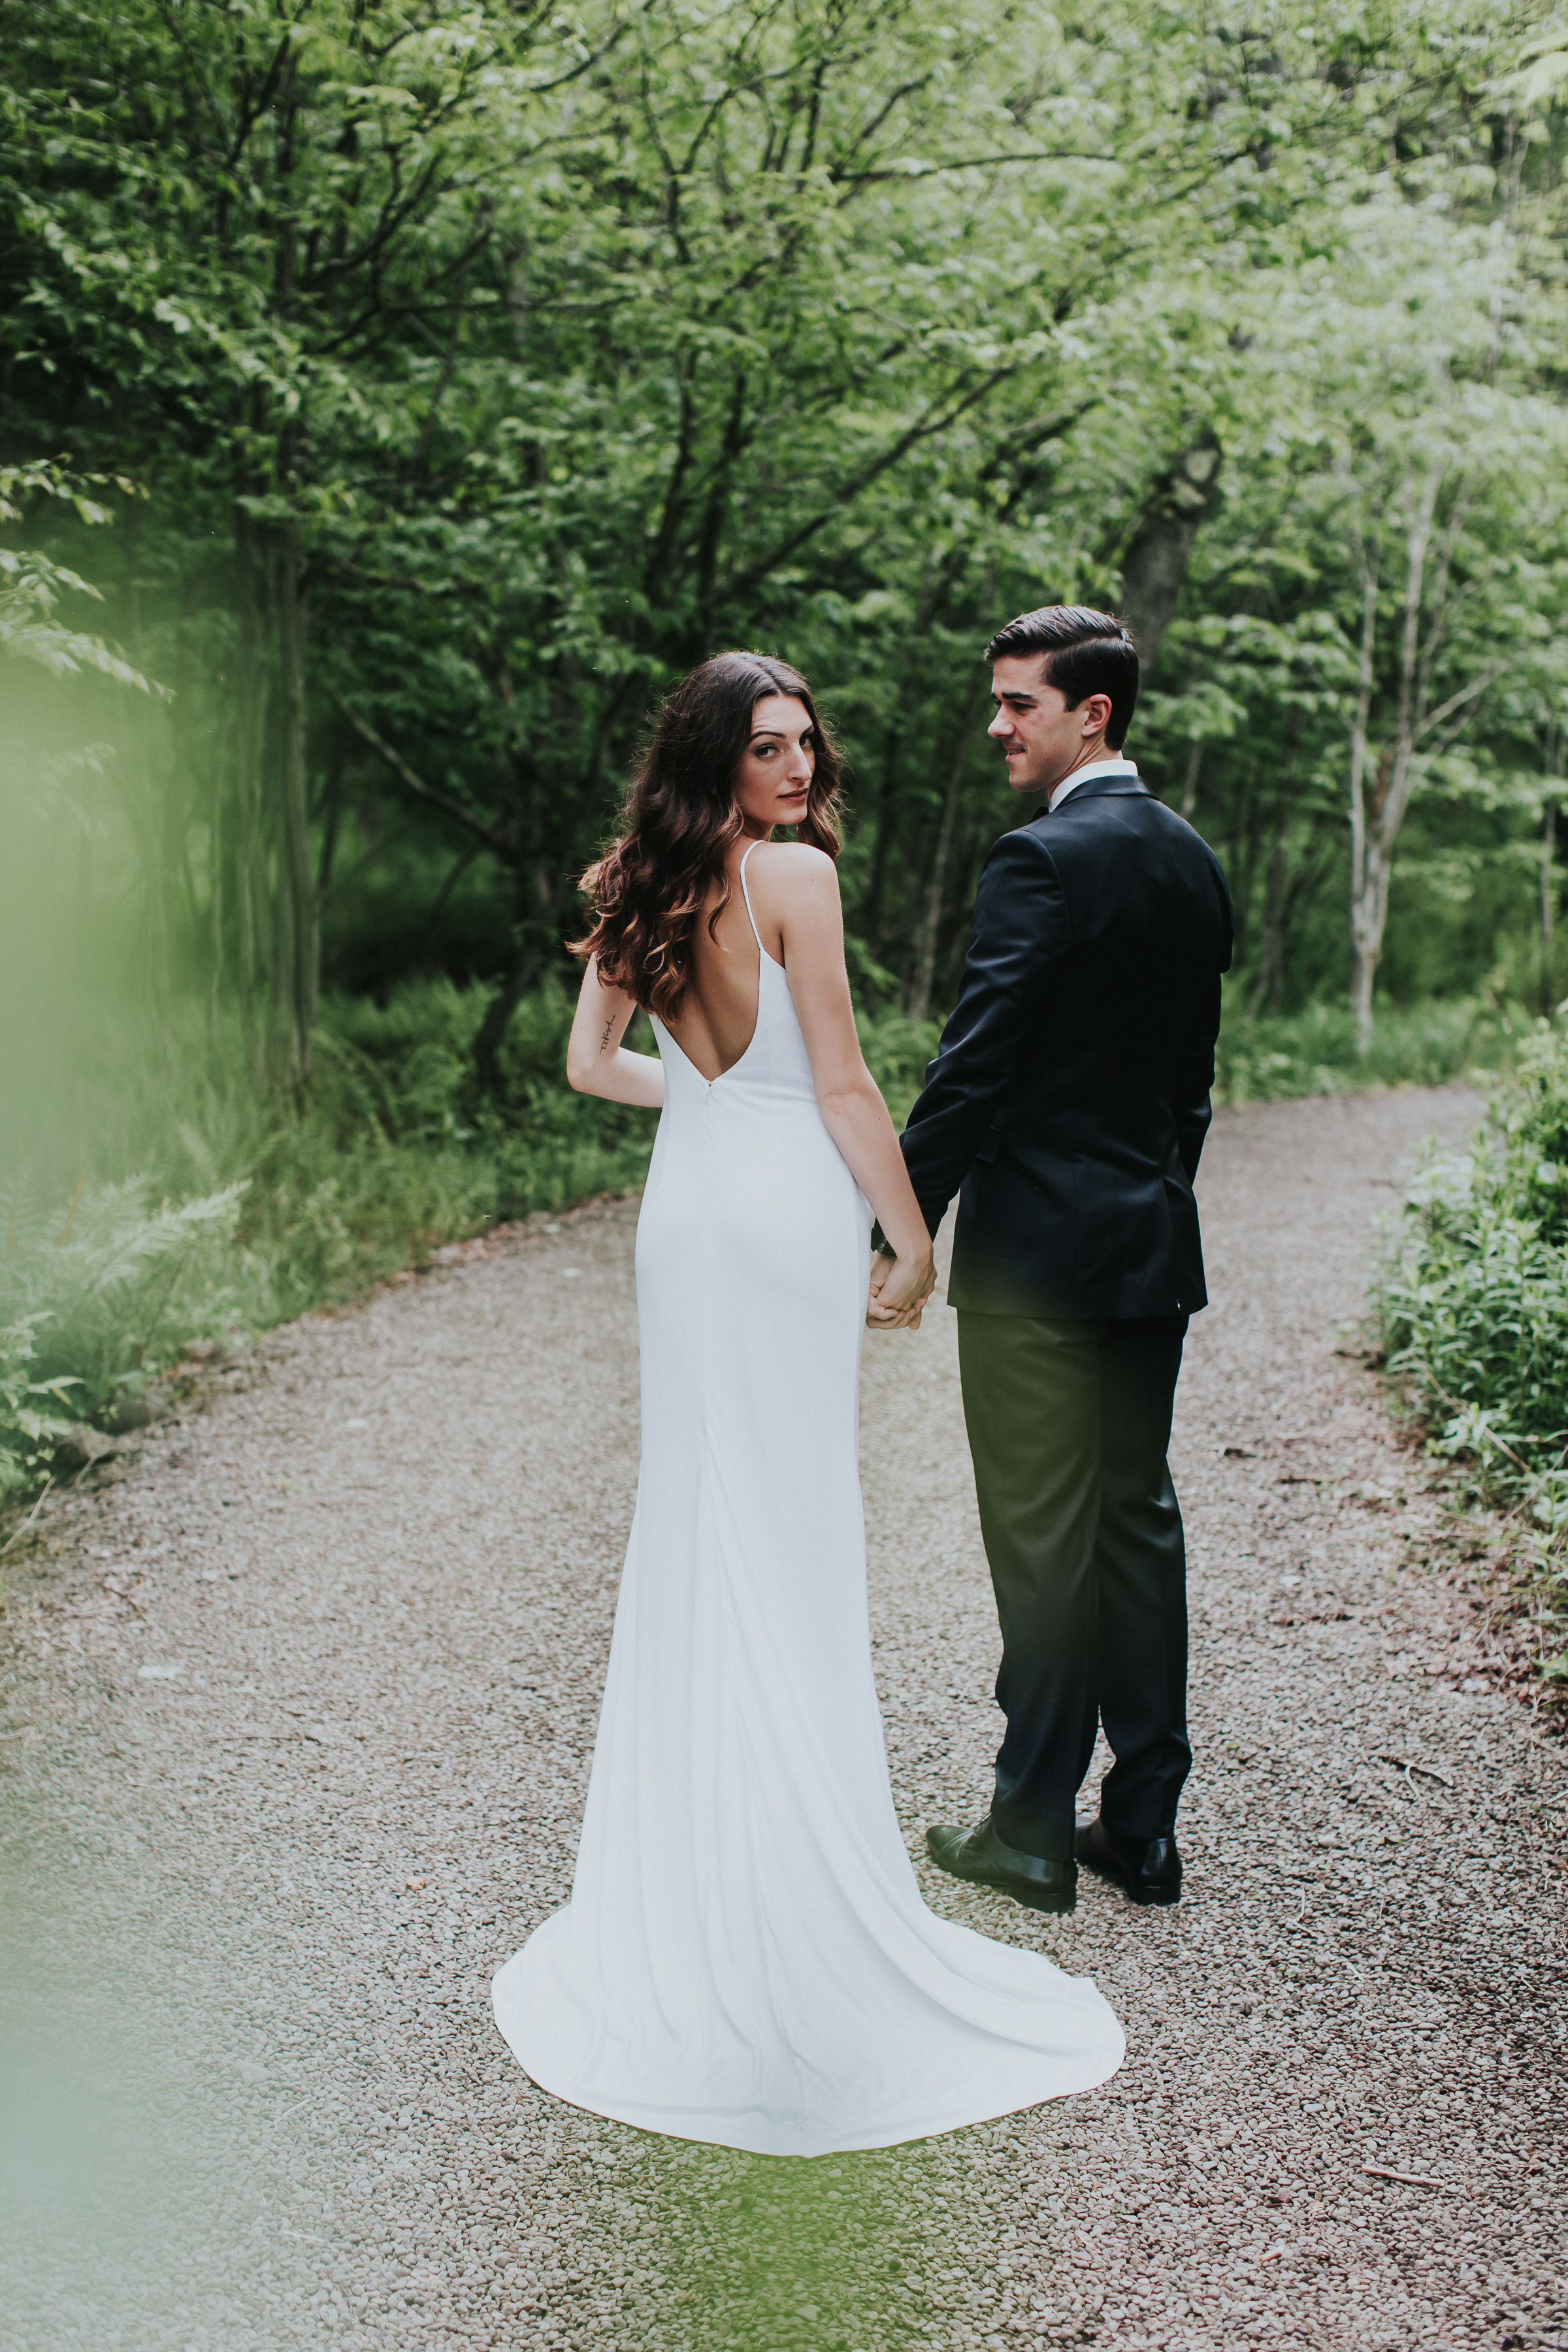 Handsome-Hollow-Long-Eddy-Catskills-New-York-Fine-Art-Documentary-Wedding-Photographer-89.jpg